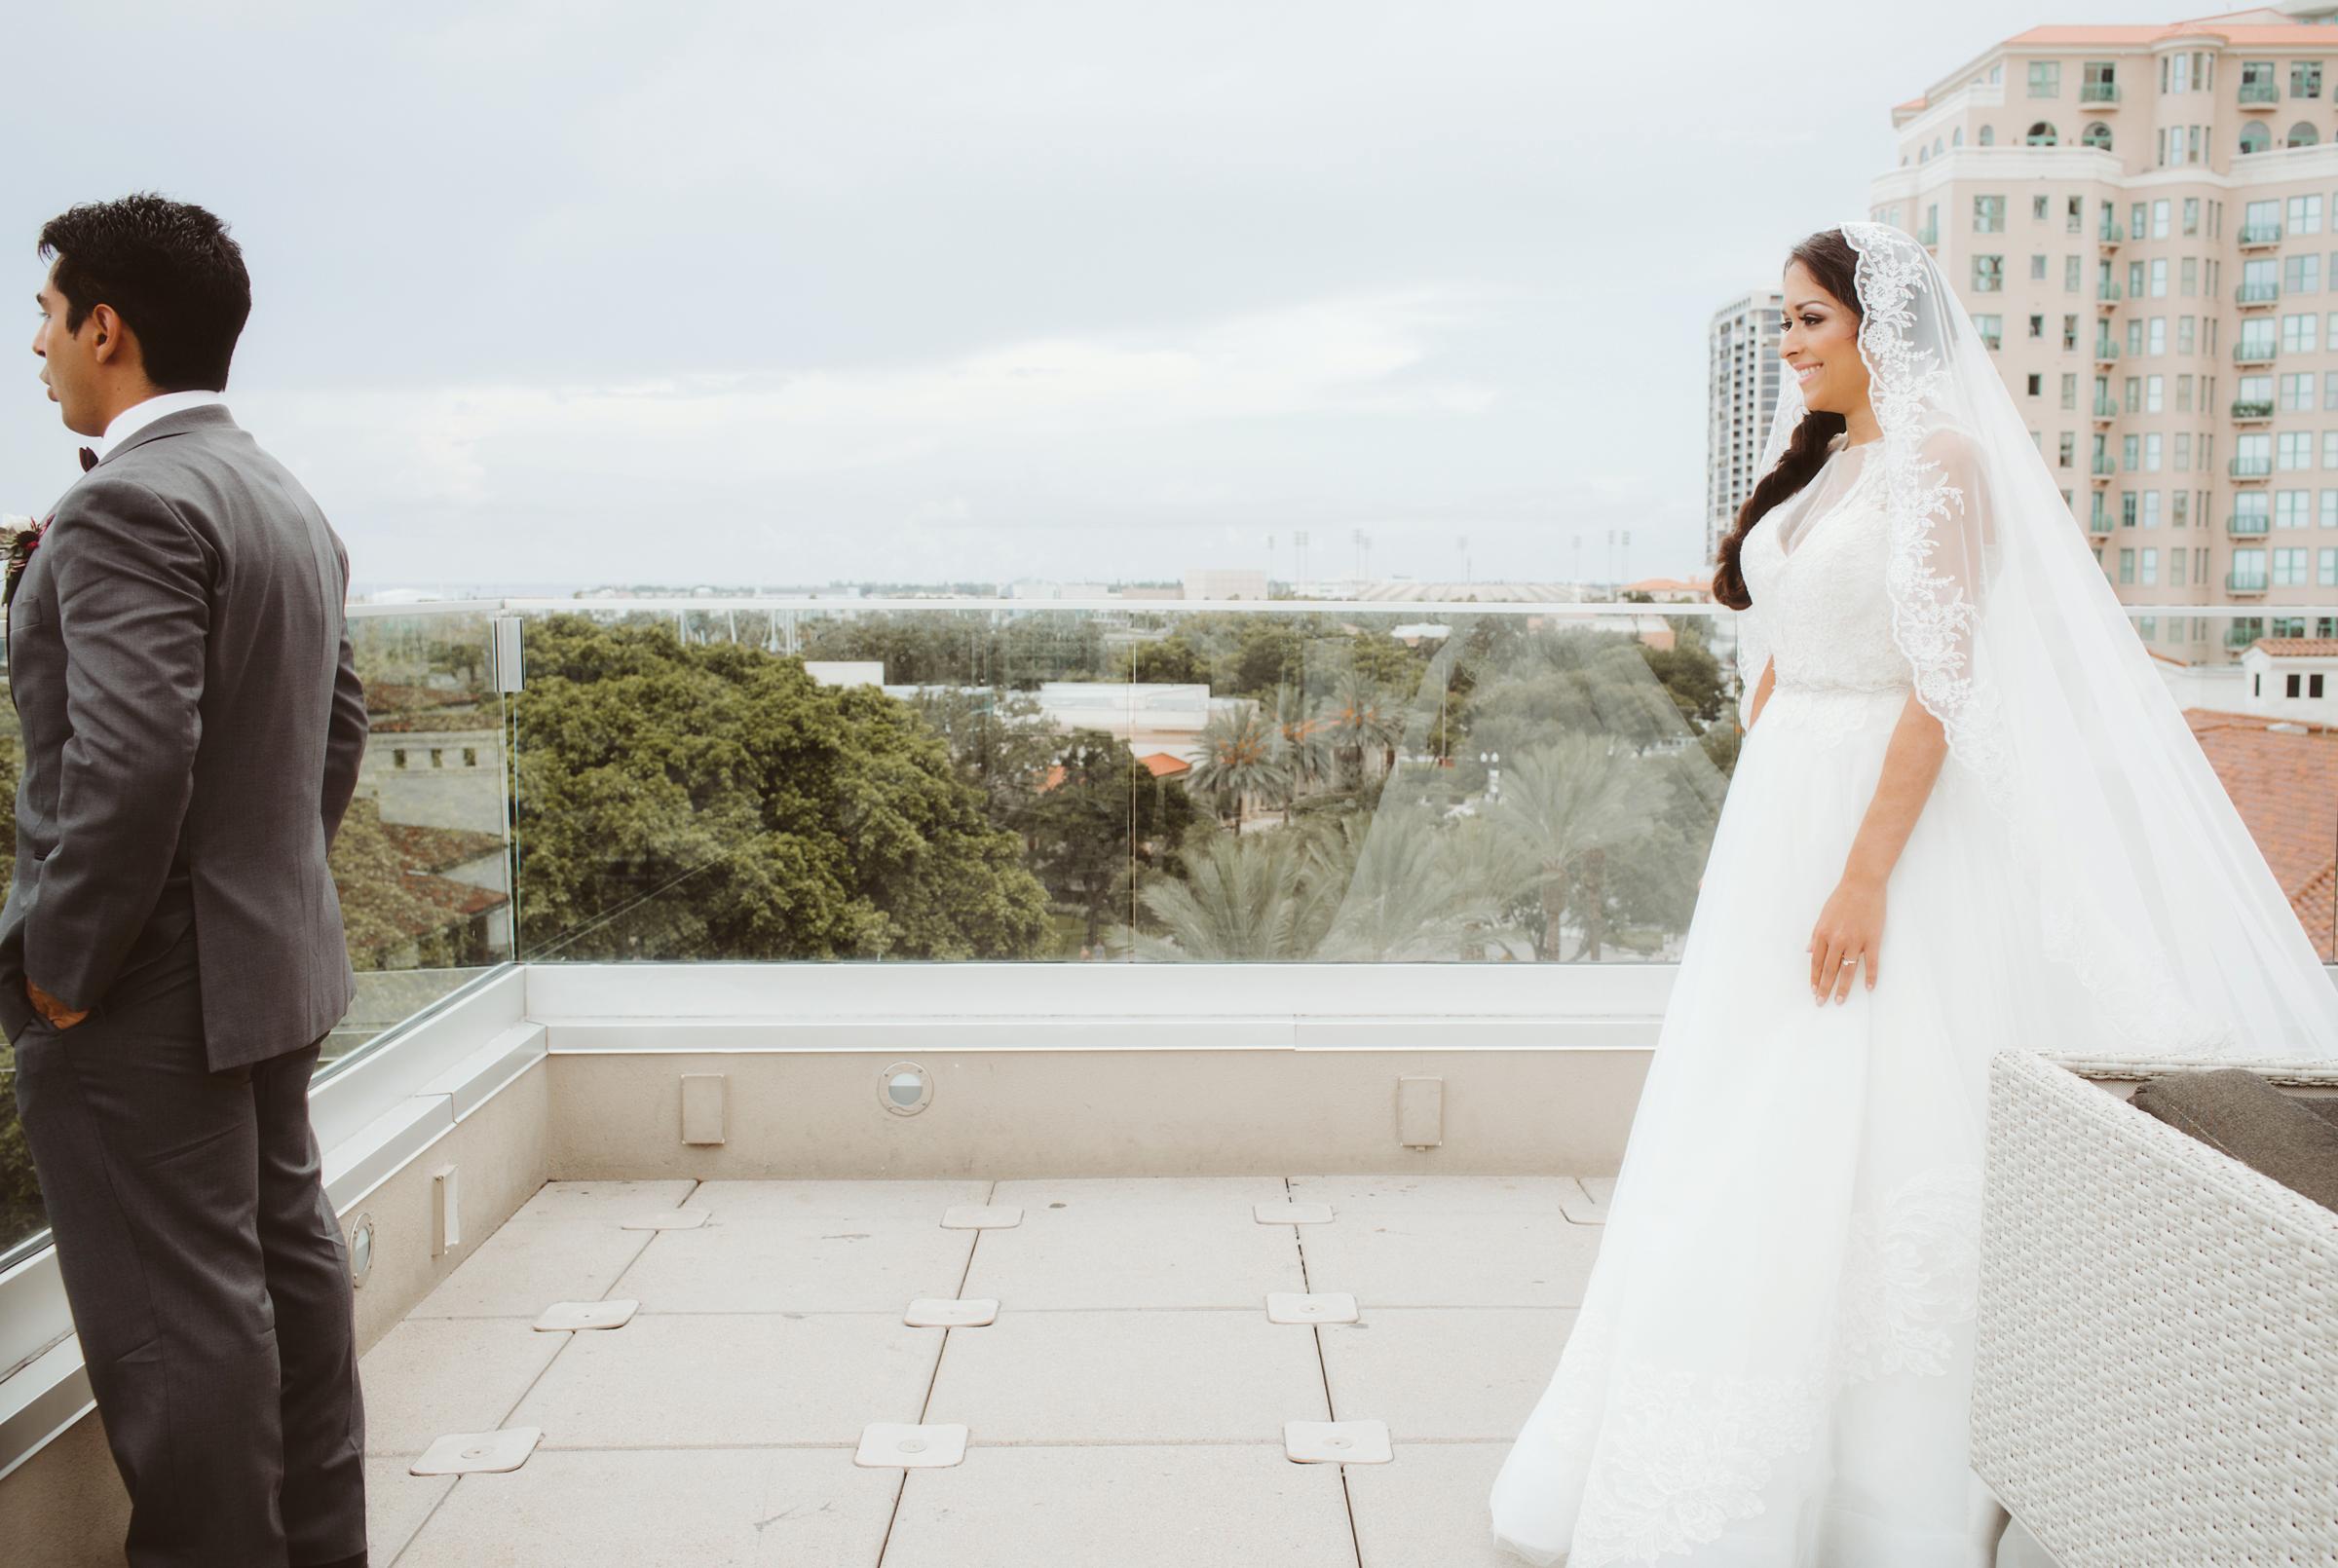 wedding day | MFA St Pete | Vanessa Boy Photography | vanessaboy.com-139.com |final.jpg